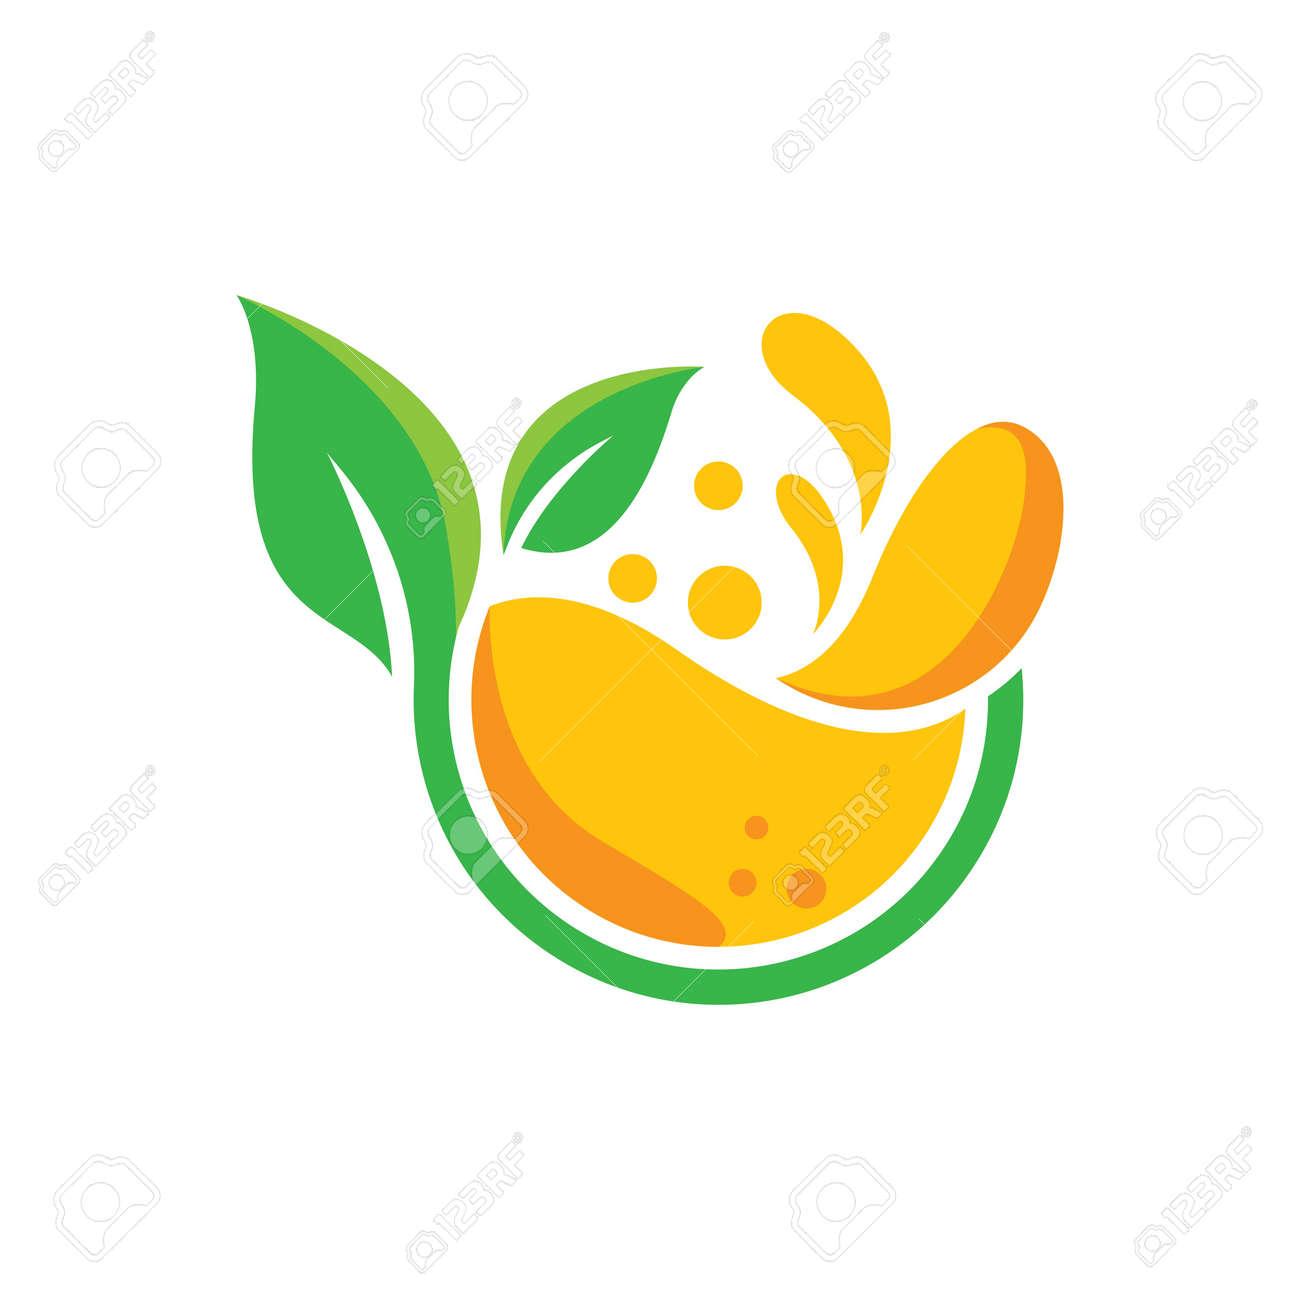 Lemon logo images illustration design - 173410505